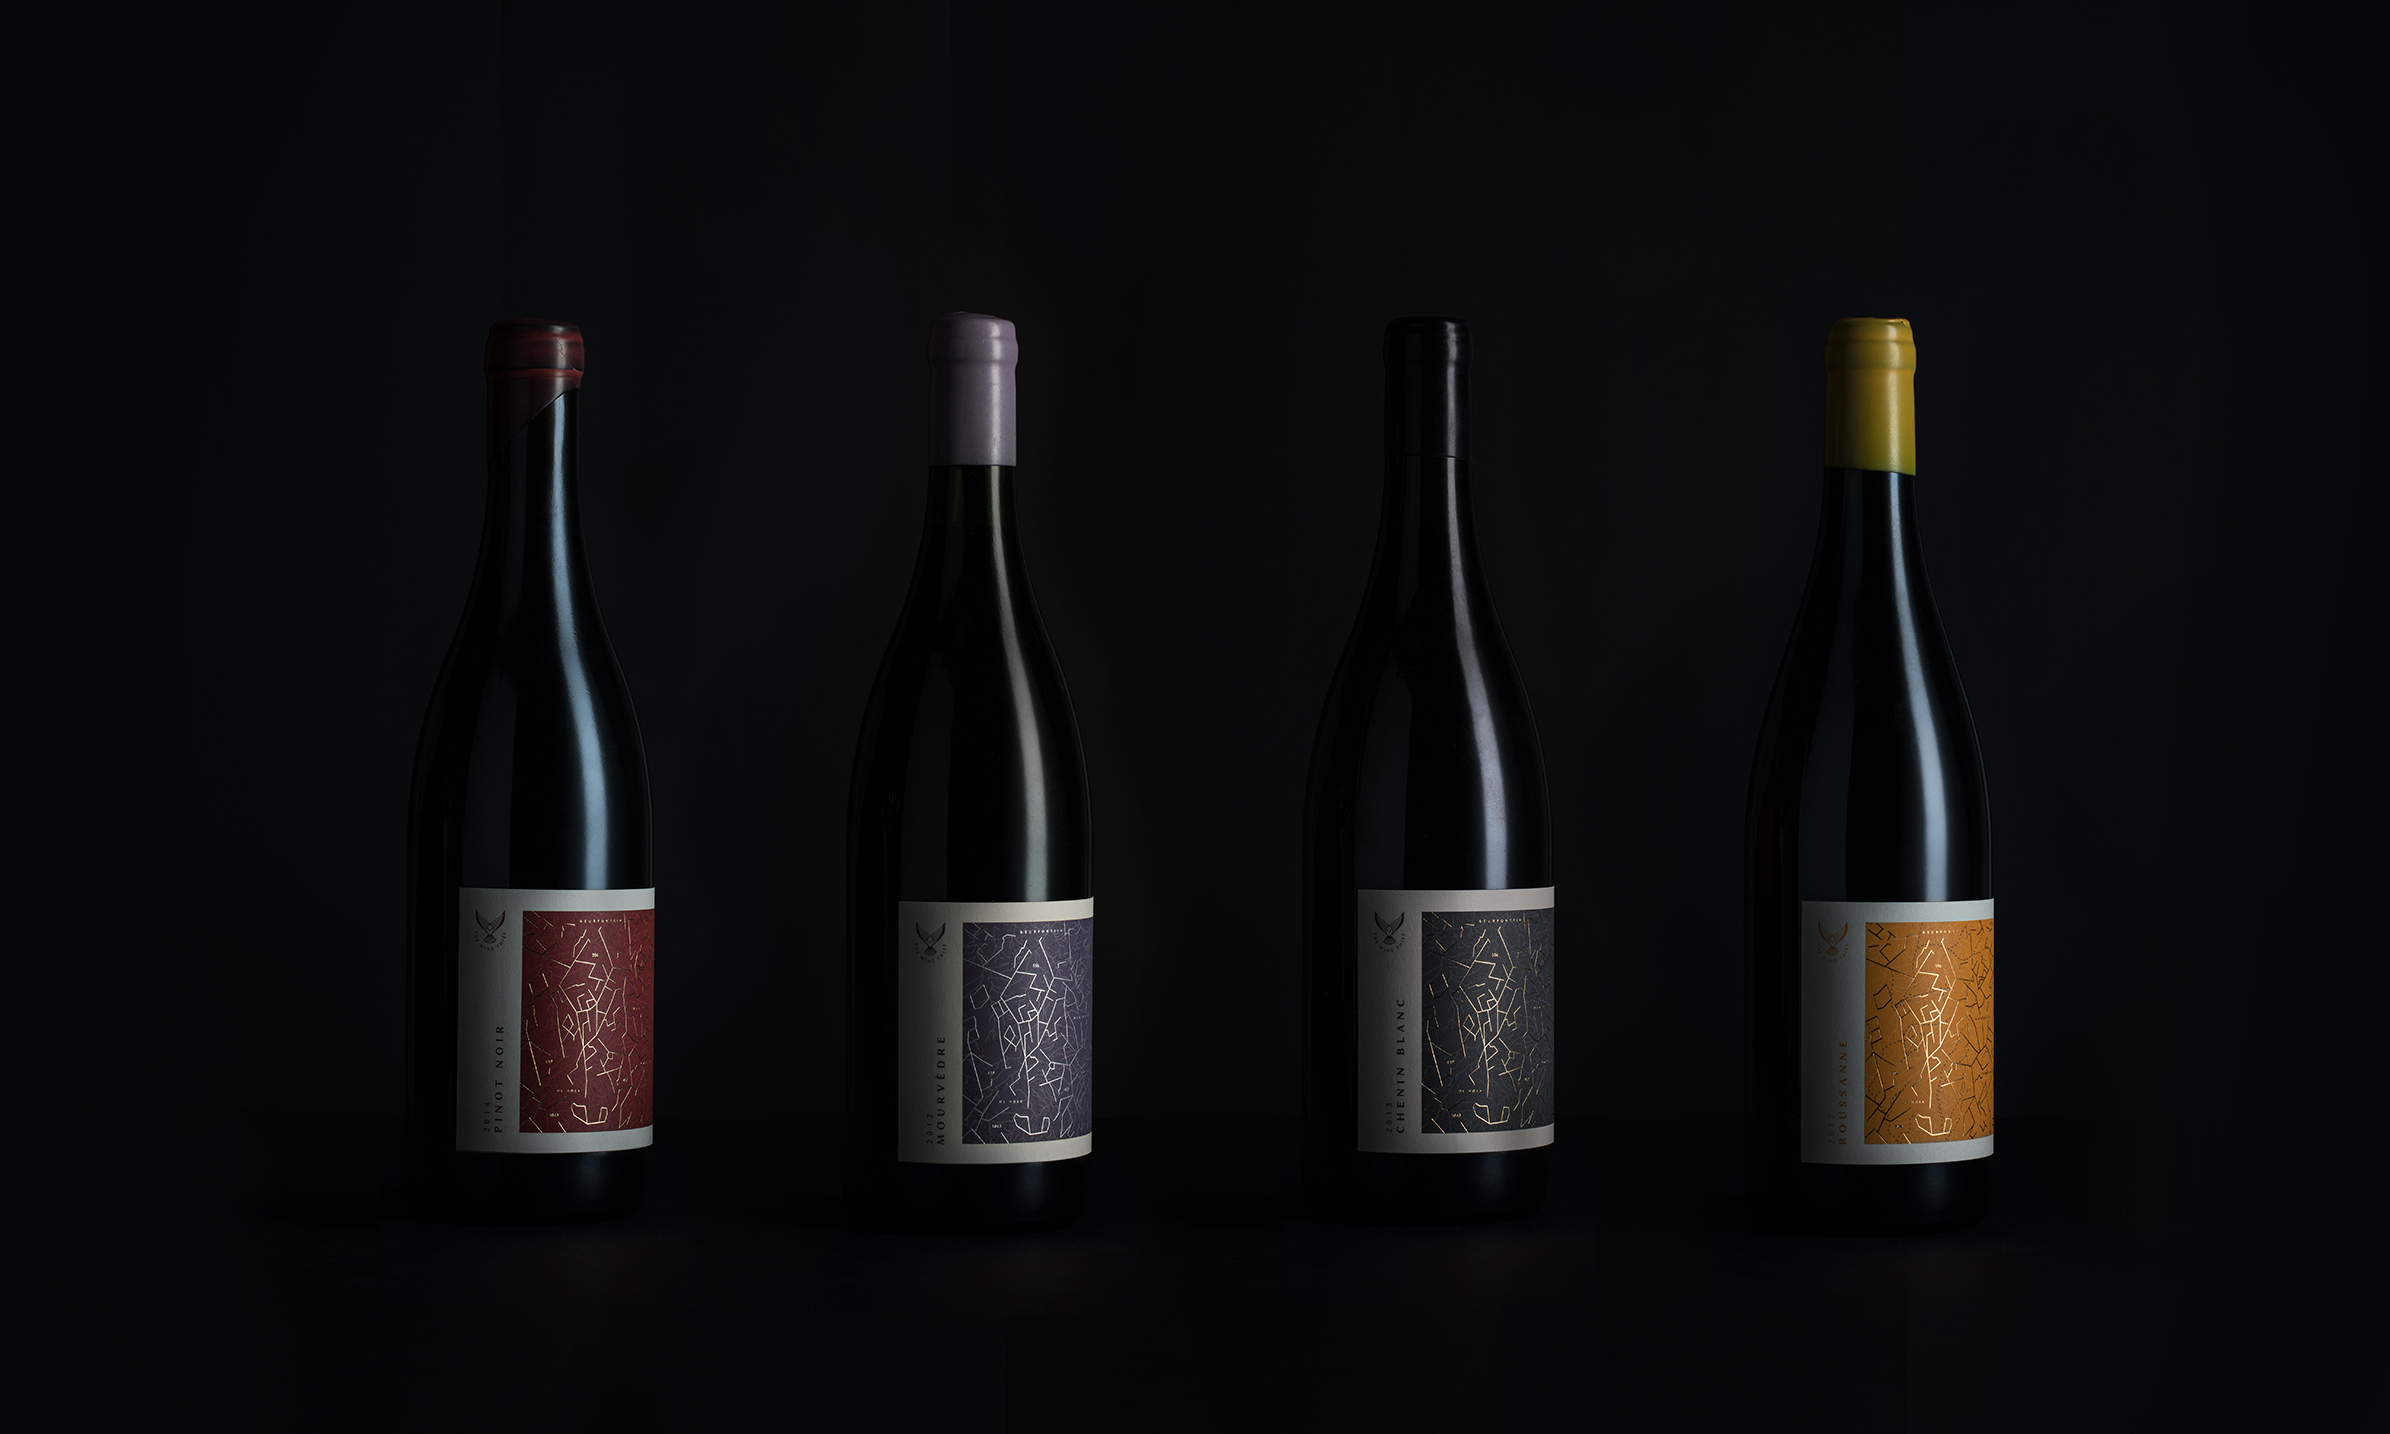 Wine Bottles with Studio Collective branding